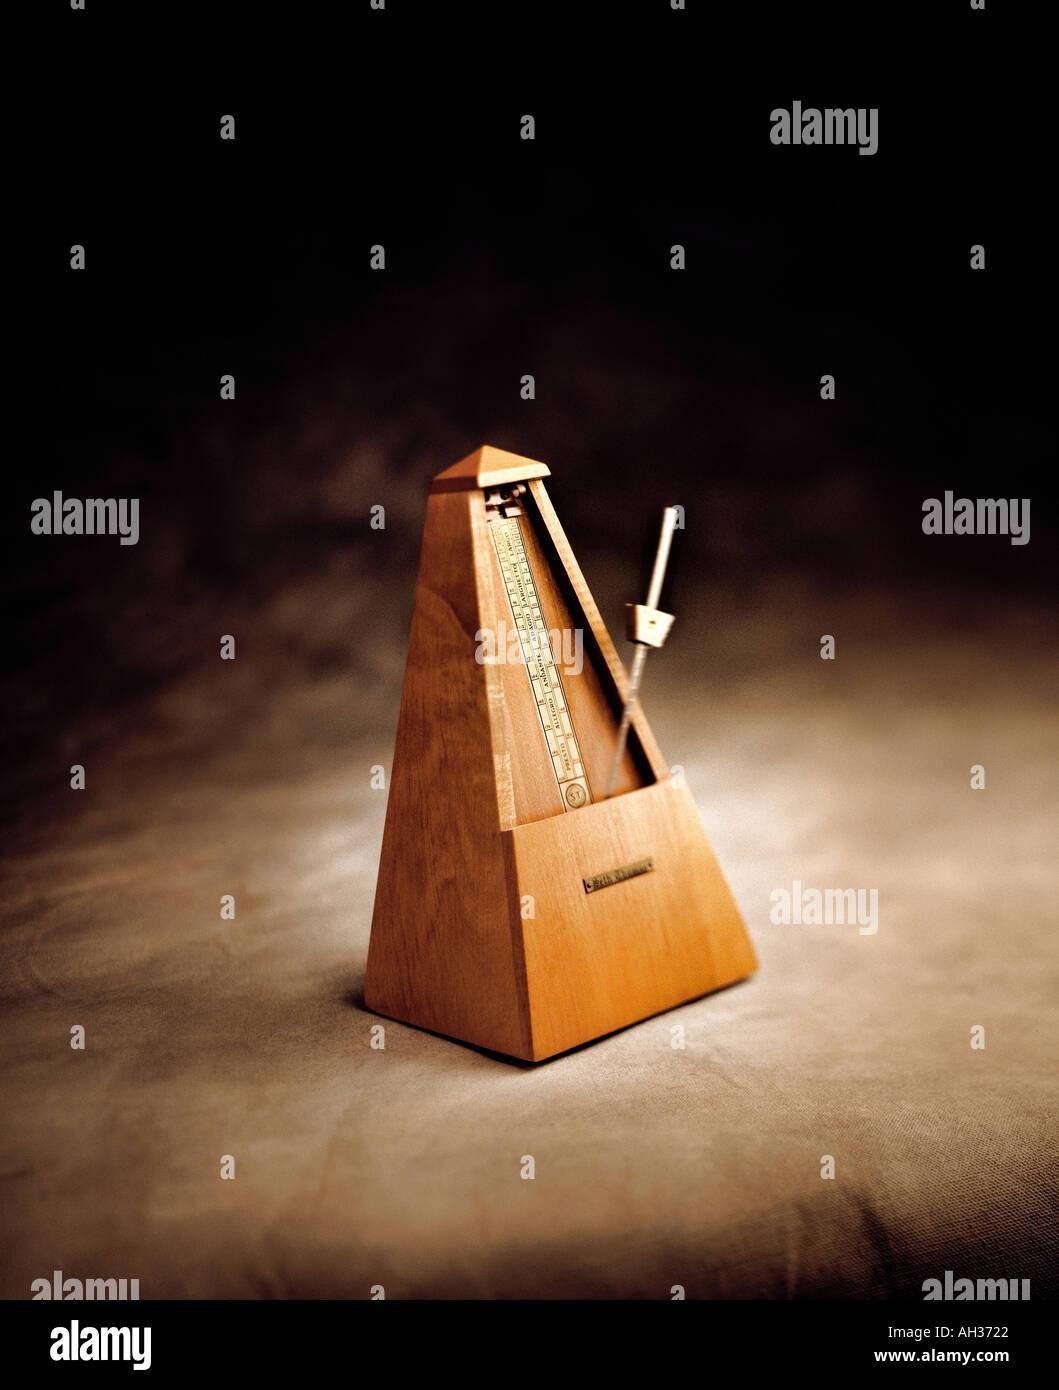 Metronome in-studio - Stock Image